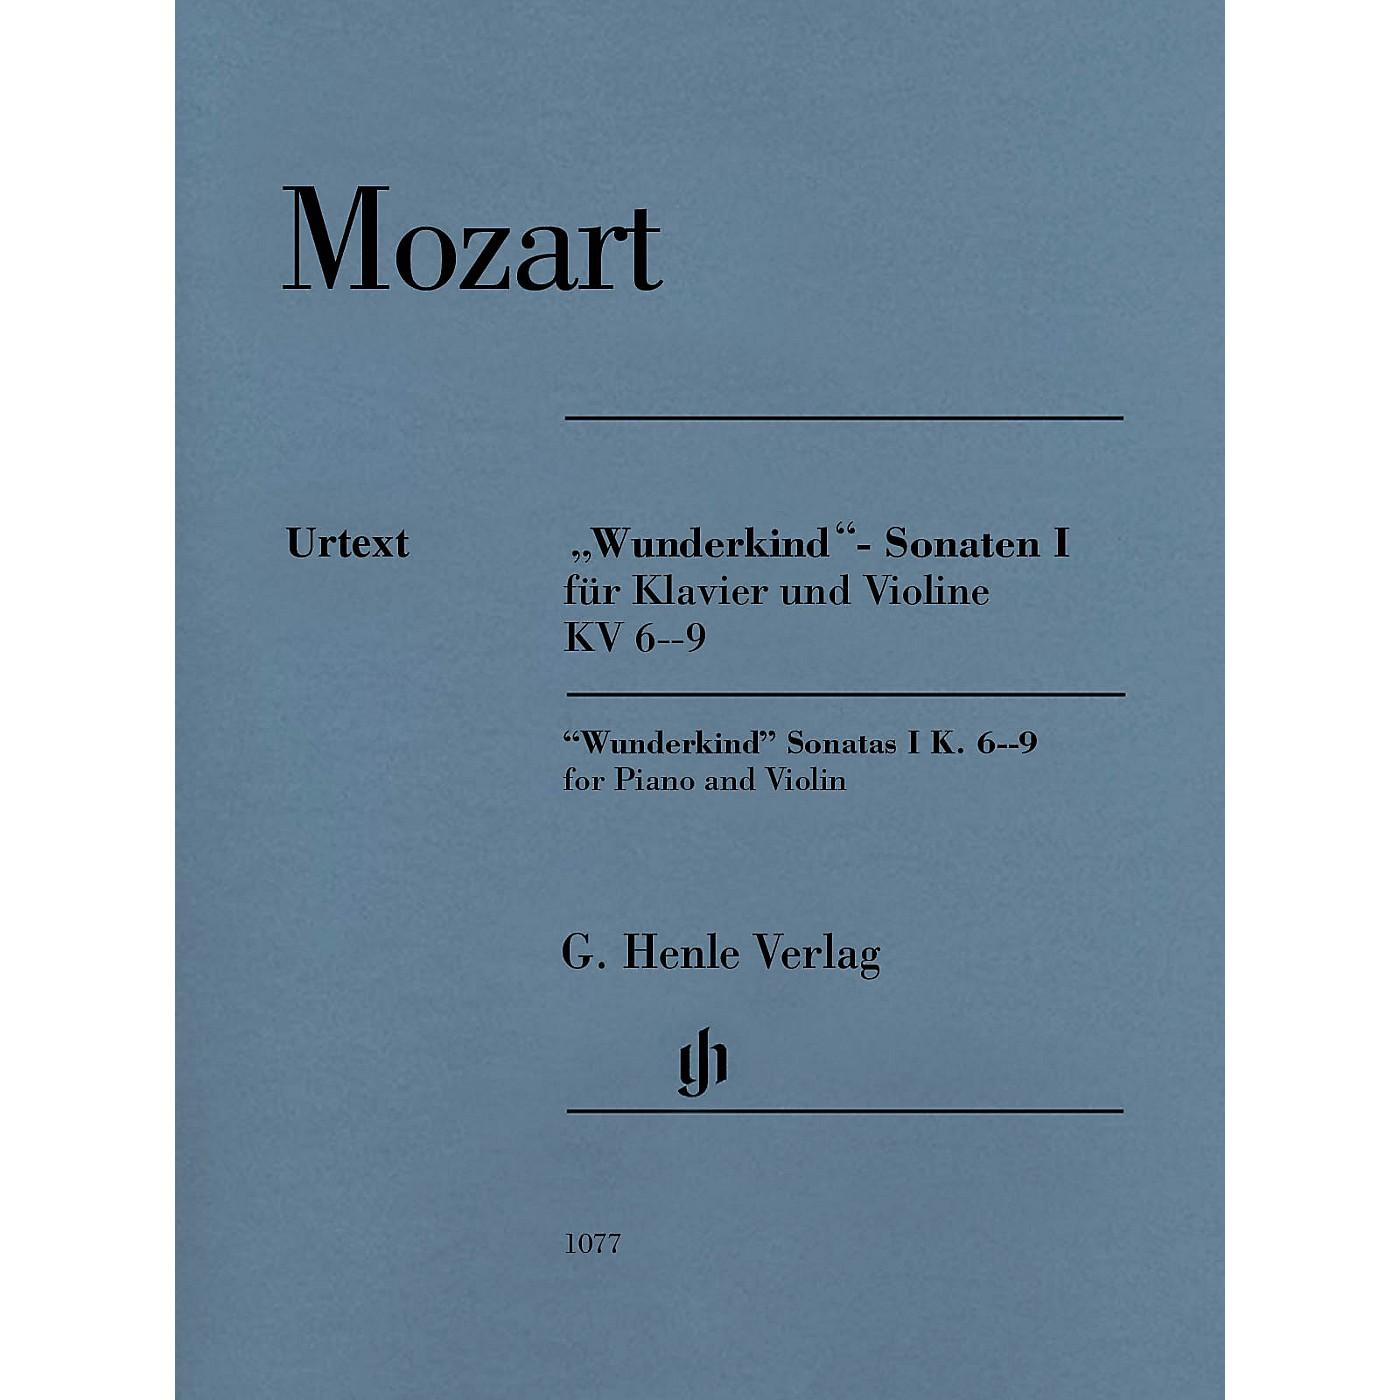 G. Henle Verlag Mozart - Wunderkind Sonatas, Vol 1, K6-9 Henle Music by Mozart Edited by Wolf-Dieter Seiffert thumbnail